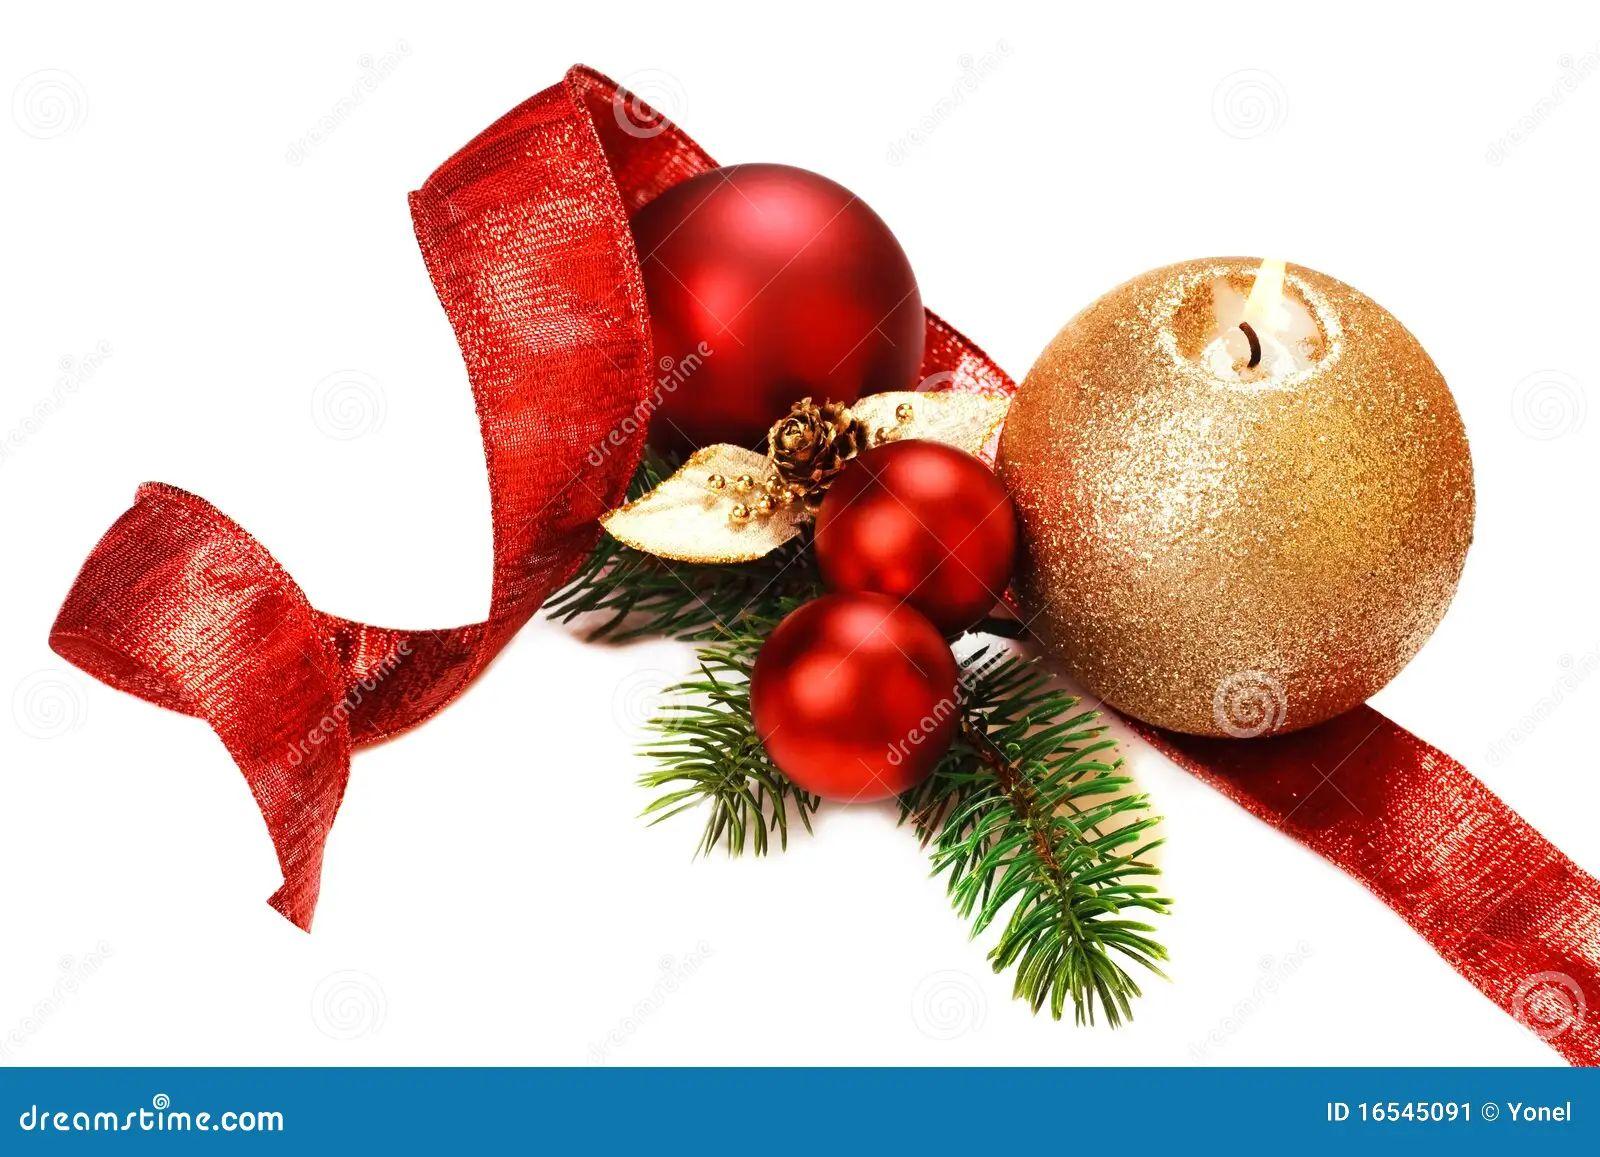 Christmas decorations on white background stock image